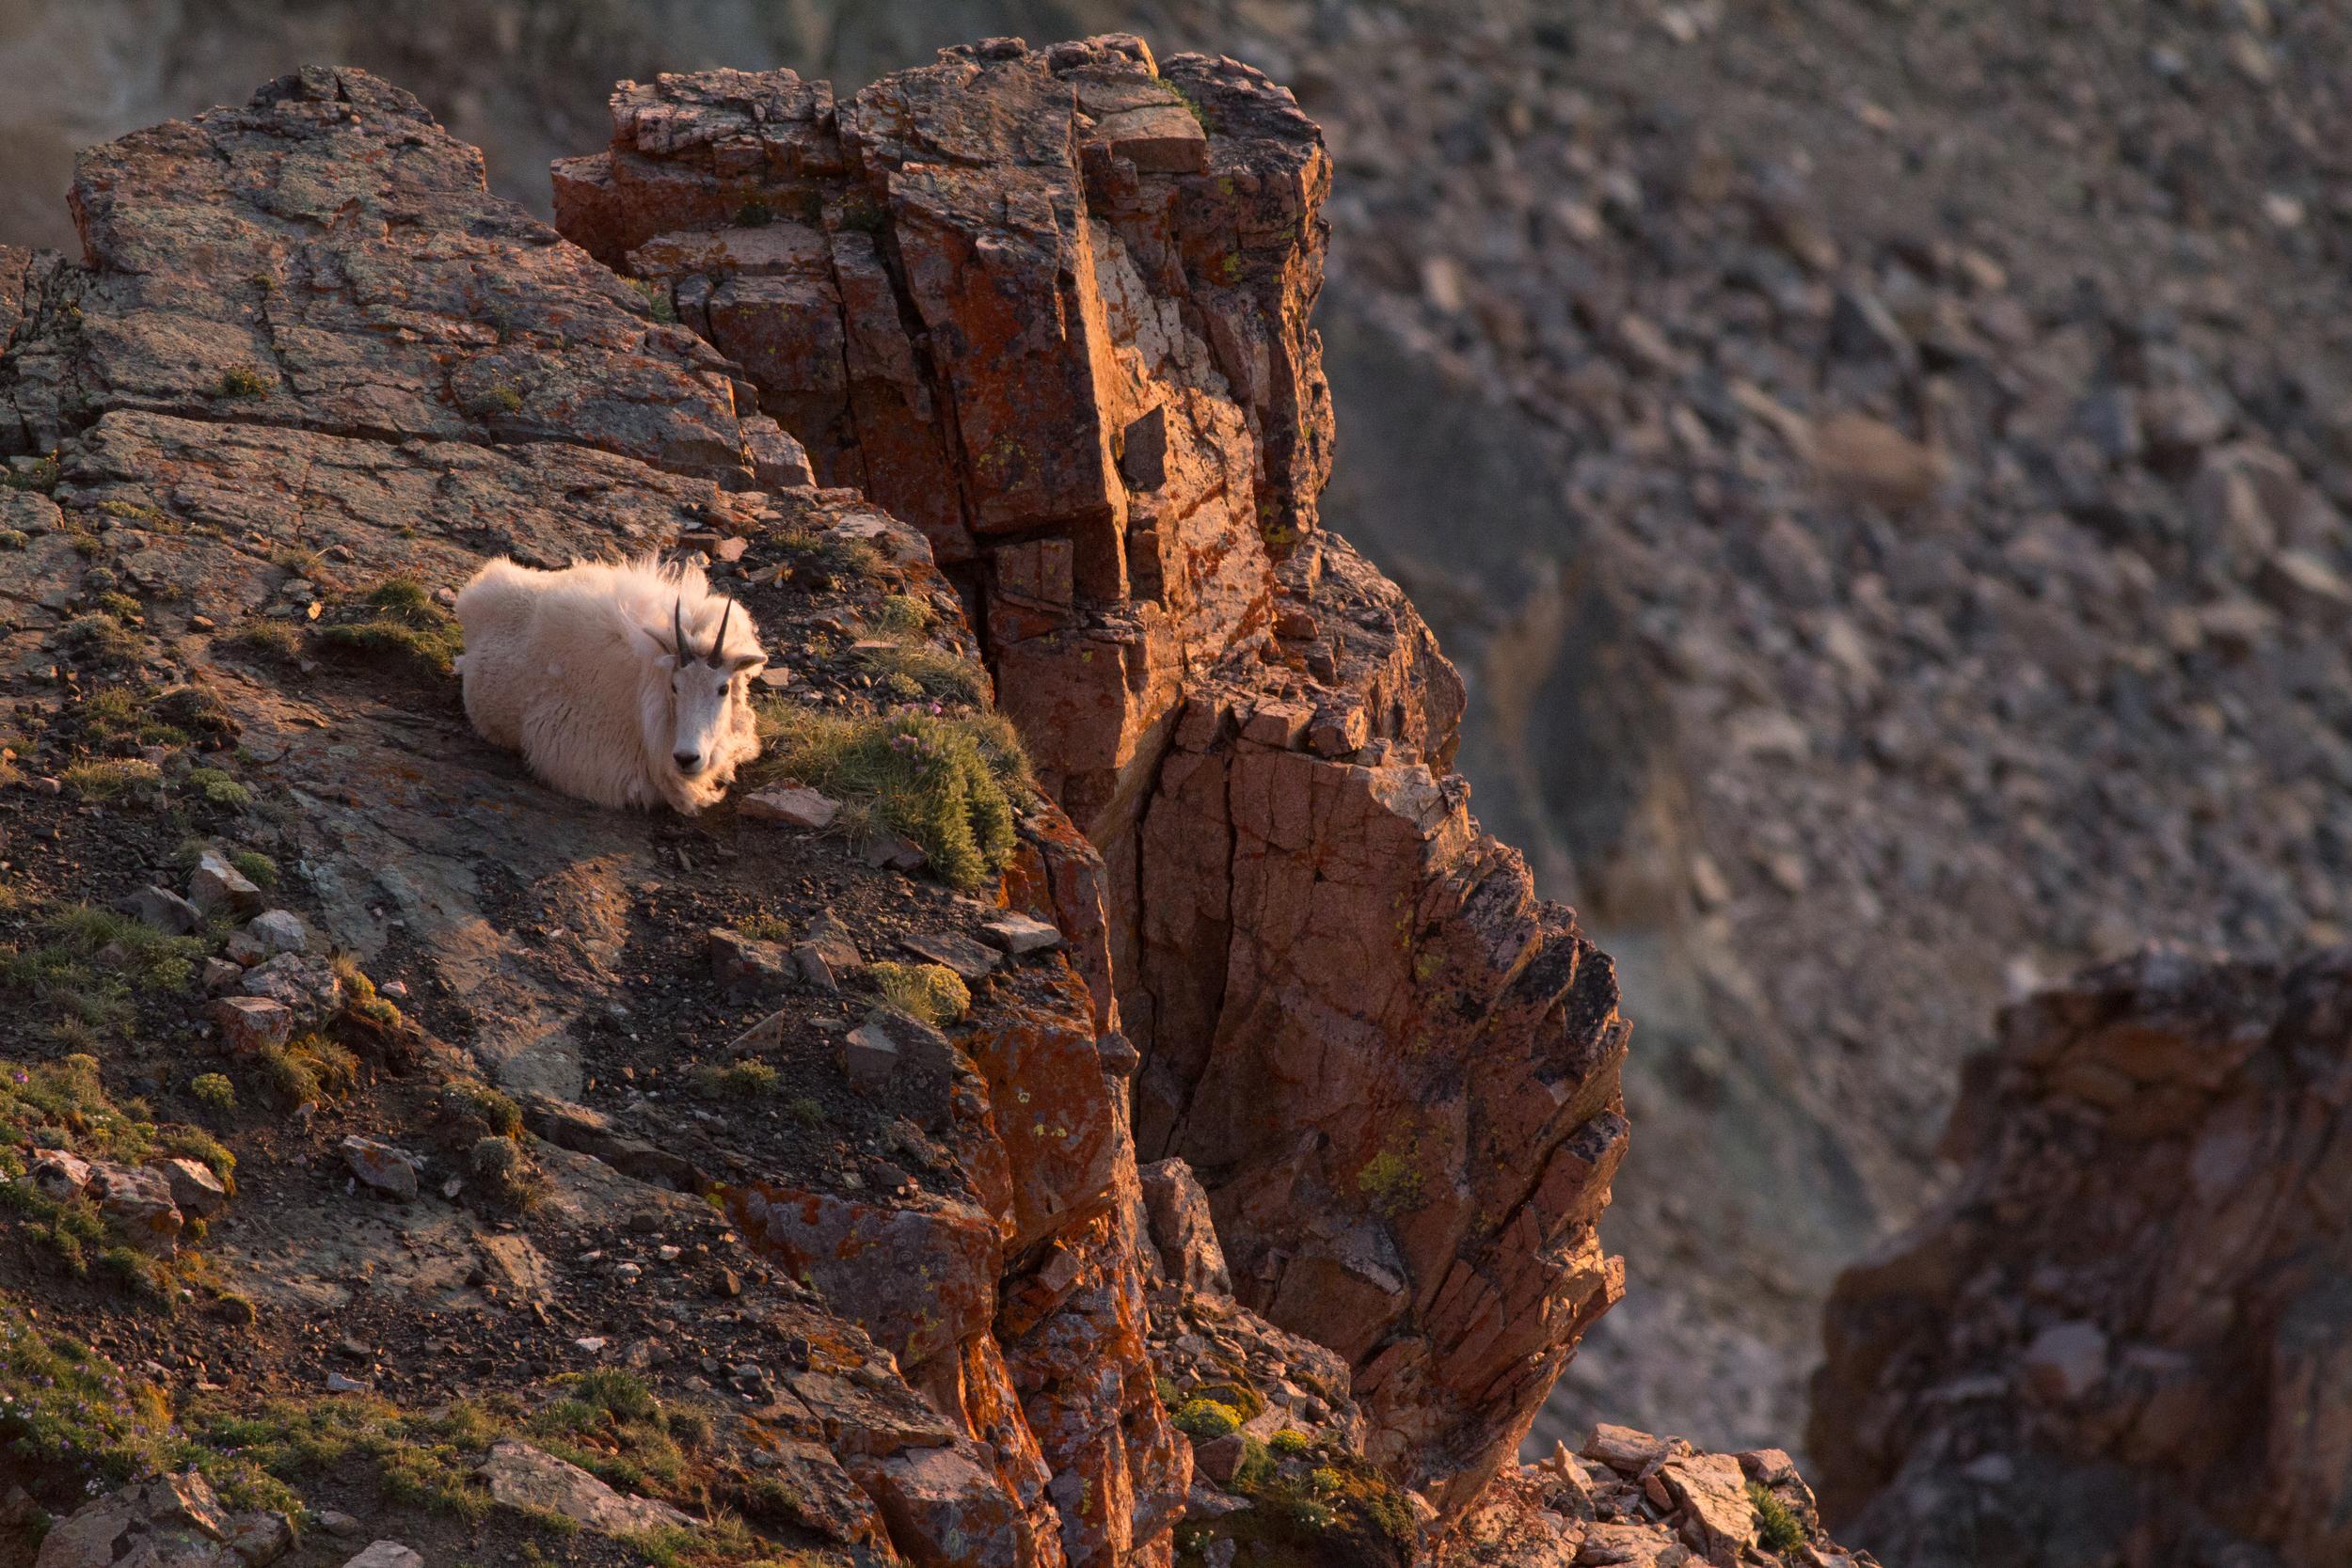 Absaroka-Beartooth Wilderness, Montana